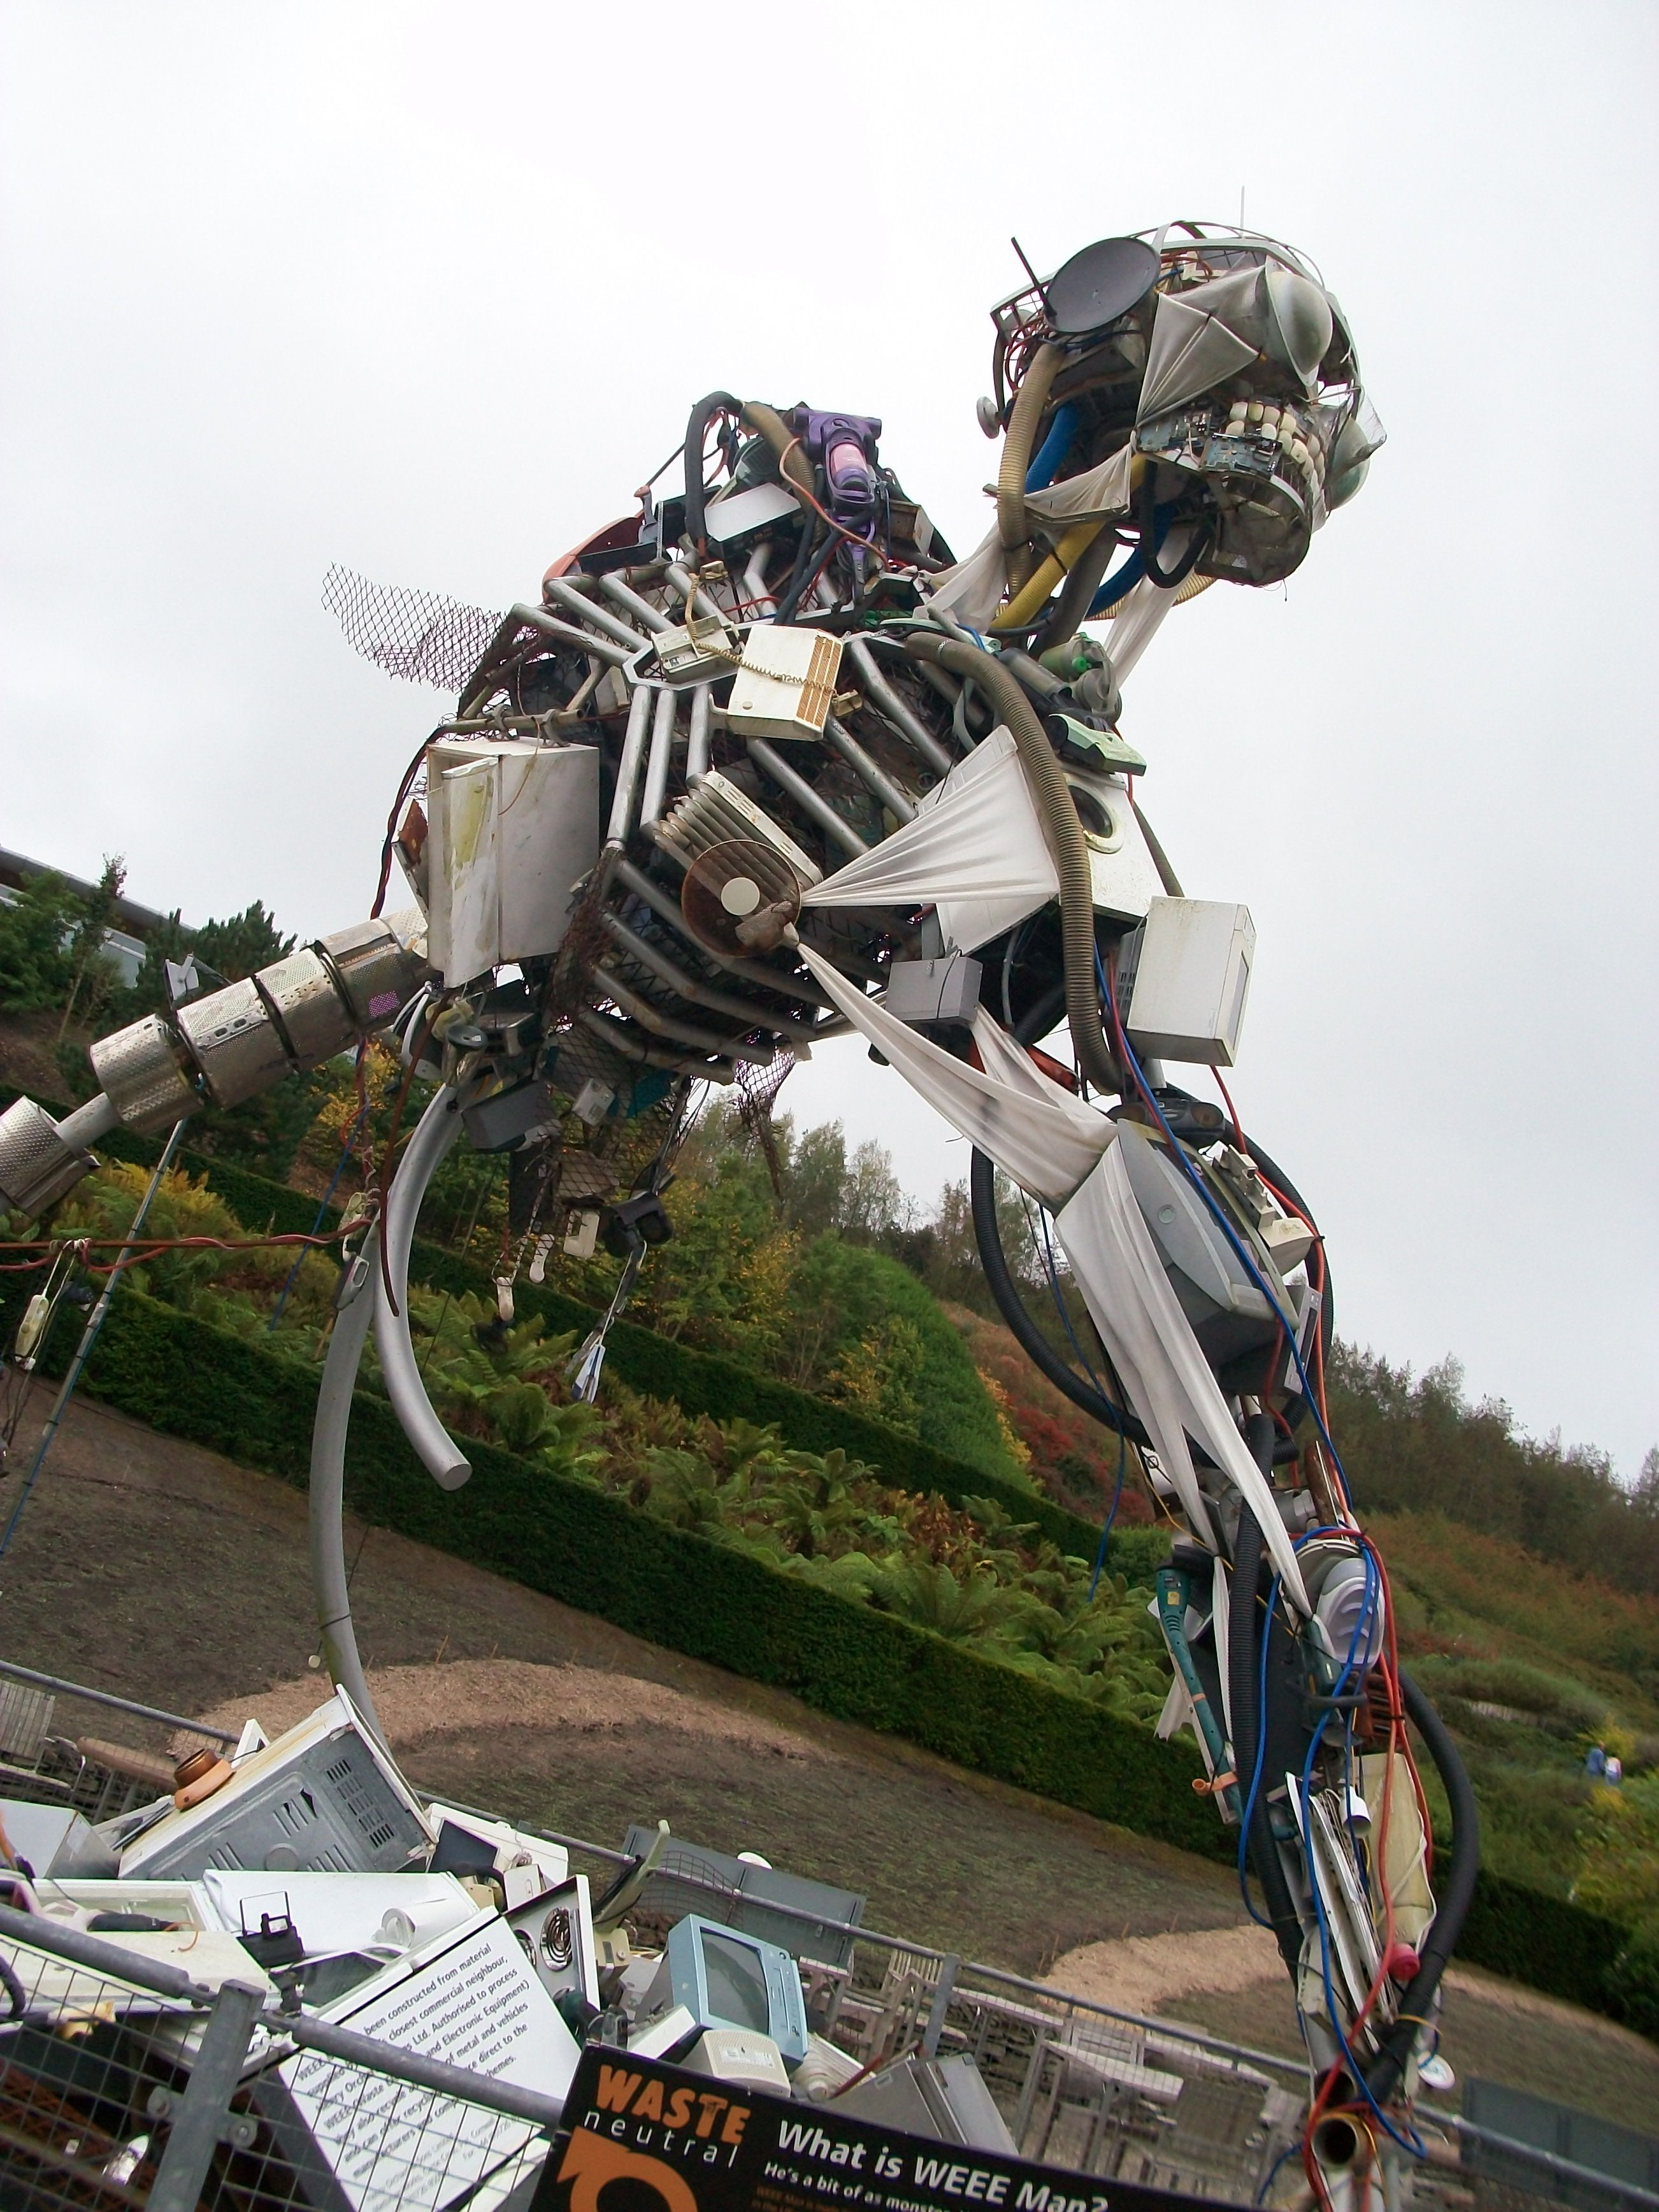 Eden Project Recycled Sculpture Artwork Art Public Art